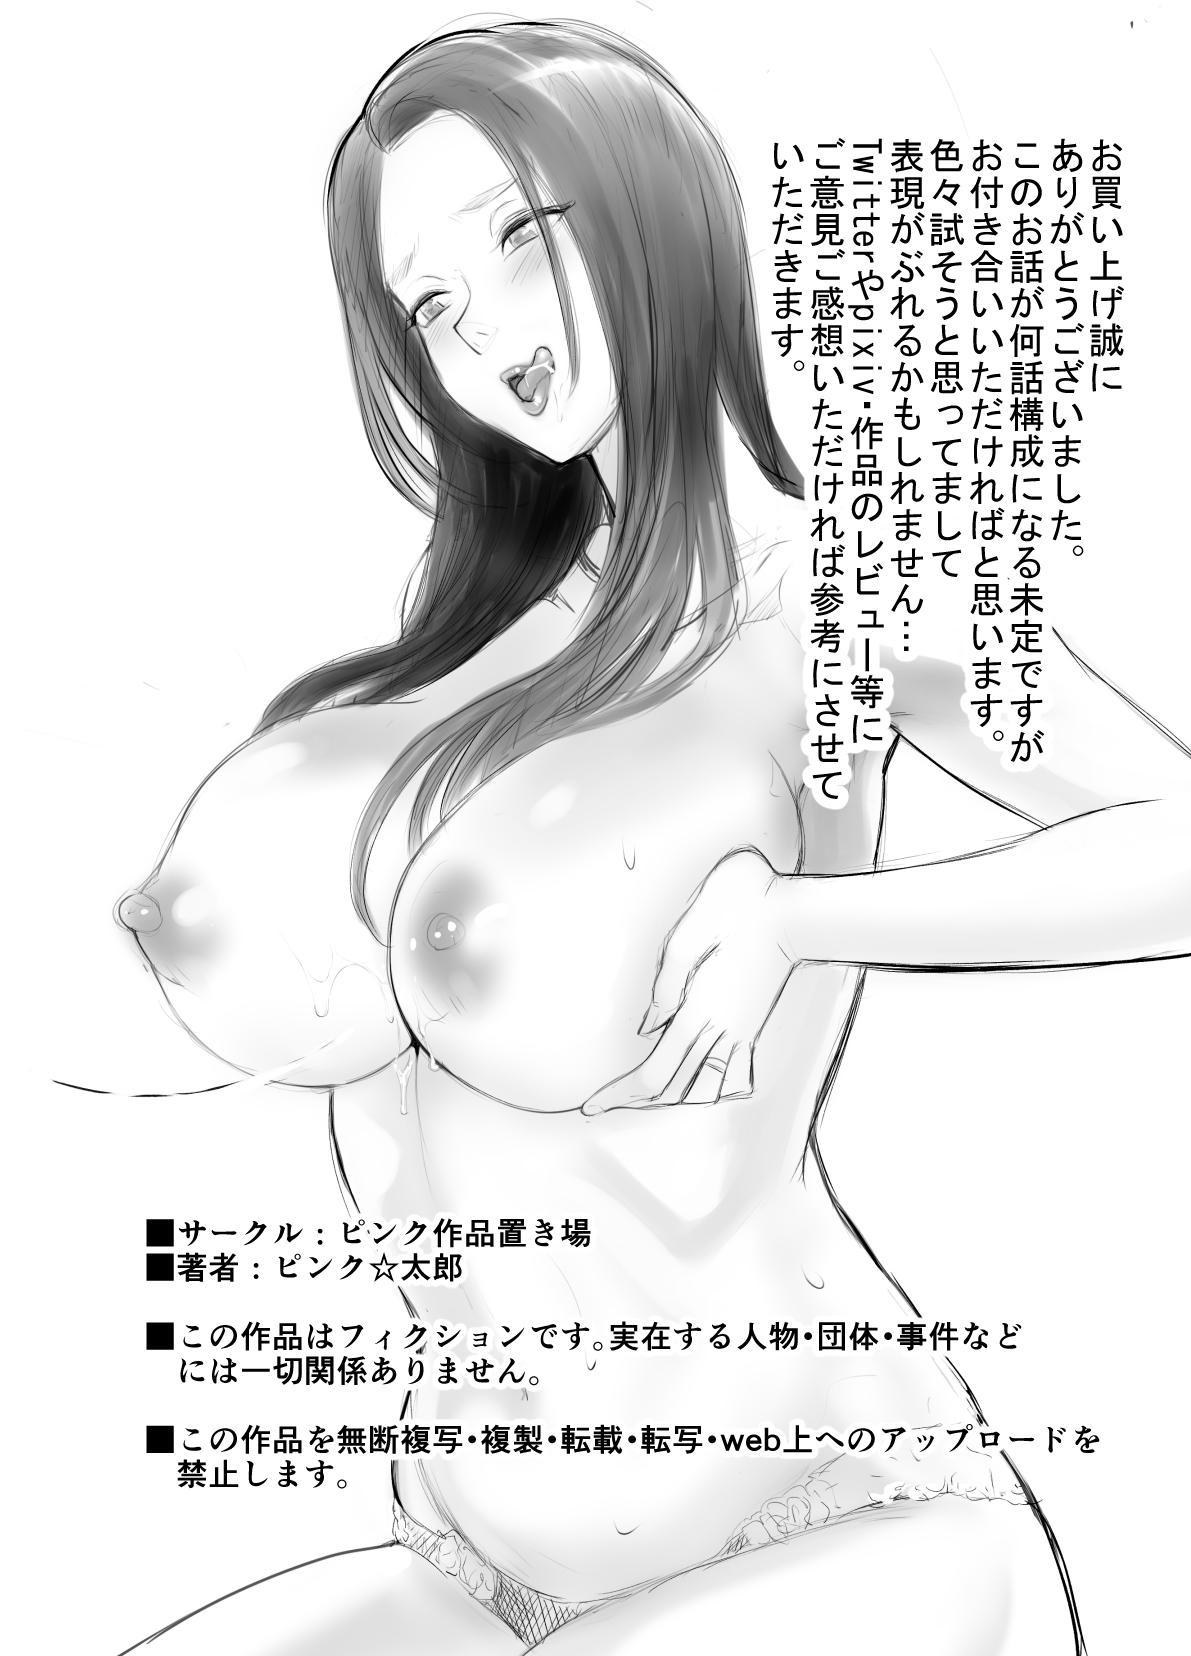 Osananajimi ga Mama to Yatte Imasu. | My Childhood Friend is Doing It with My Mom 47